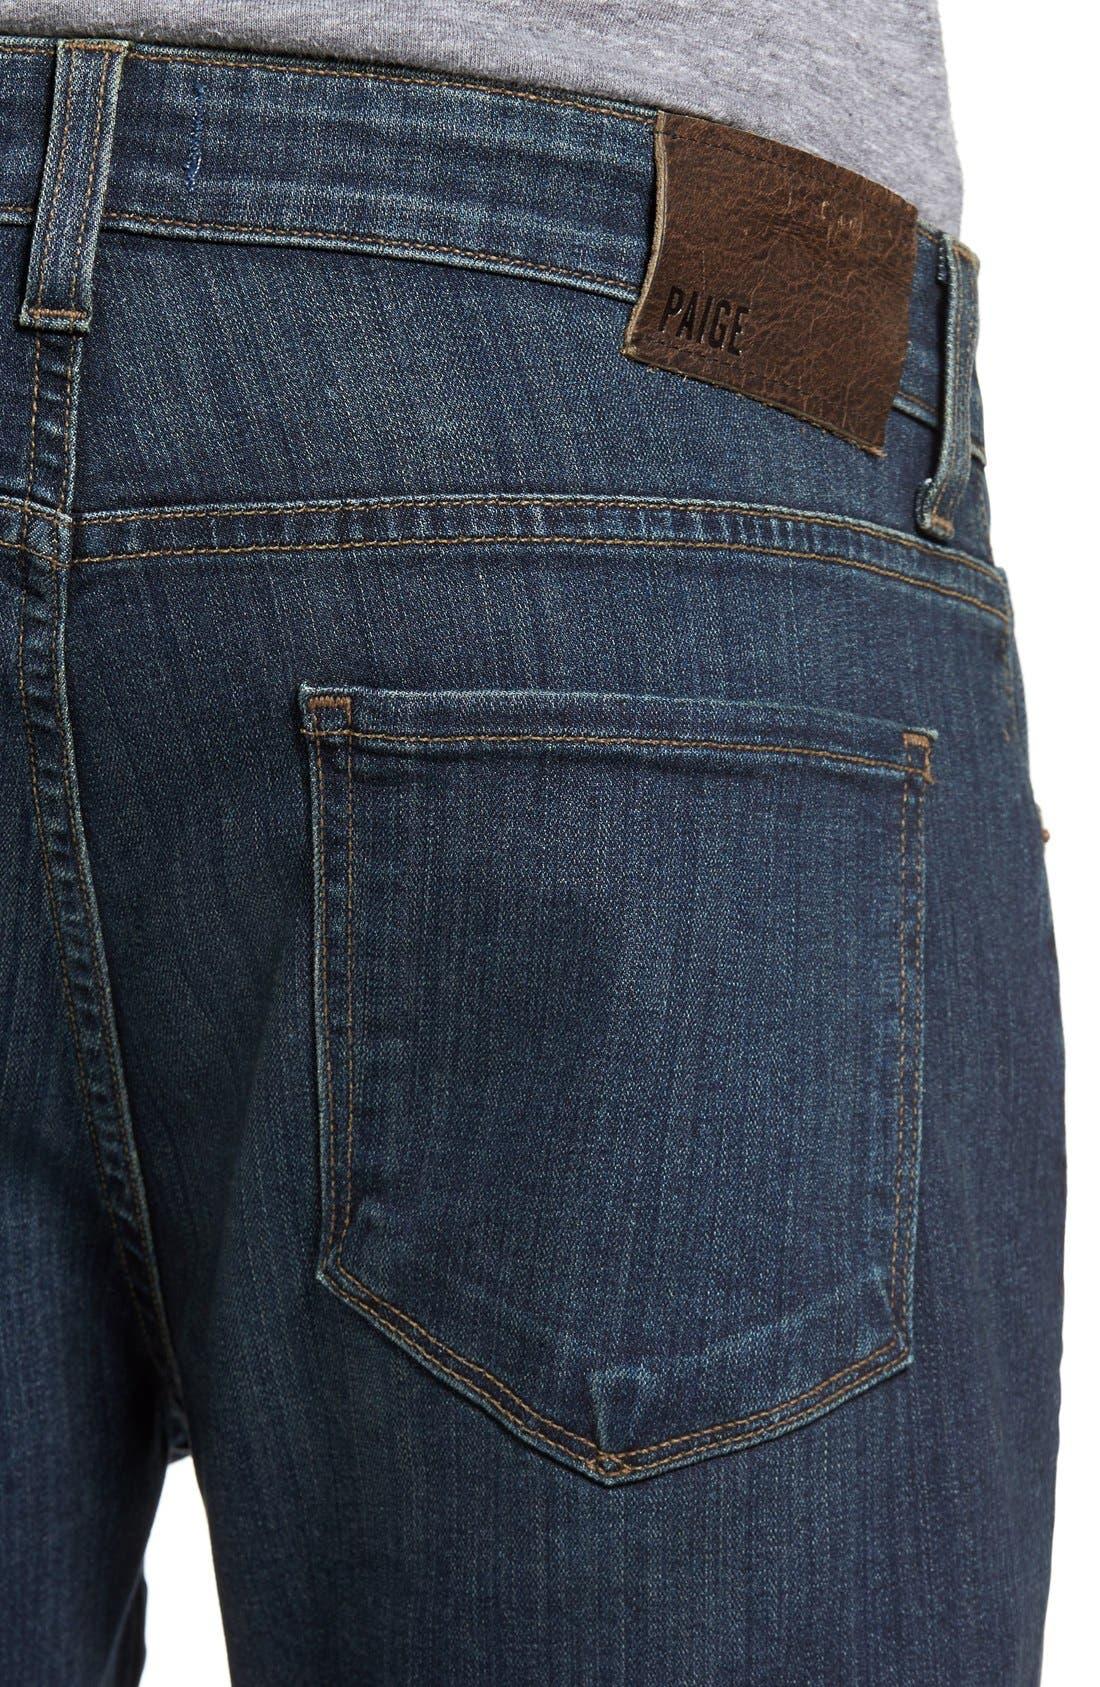 Transcend - Federal Slim Straight Leg Jeans,                             Alternate thumbnail 4, color,                             400